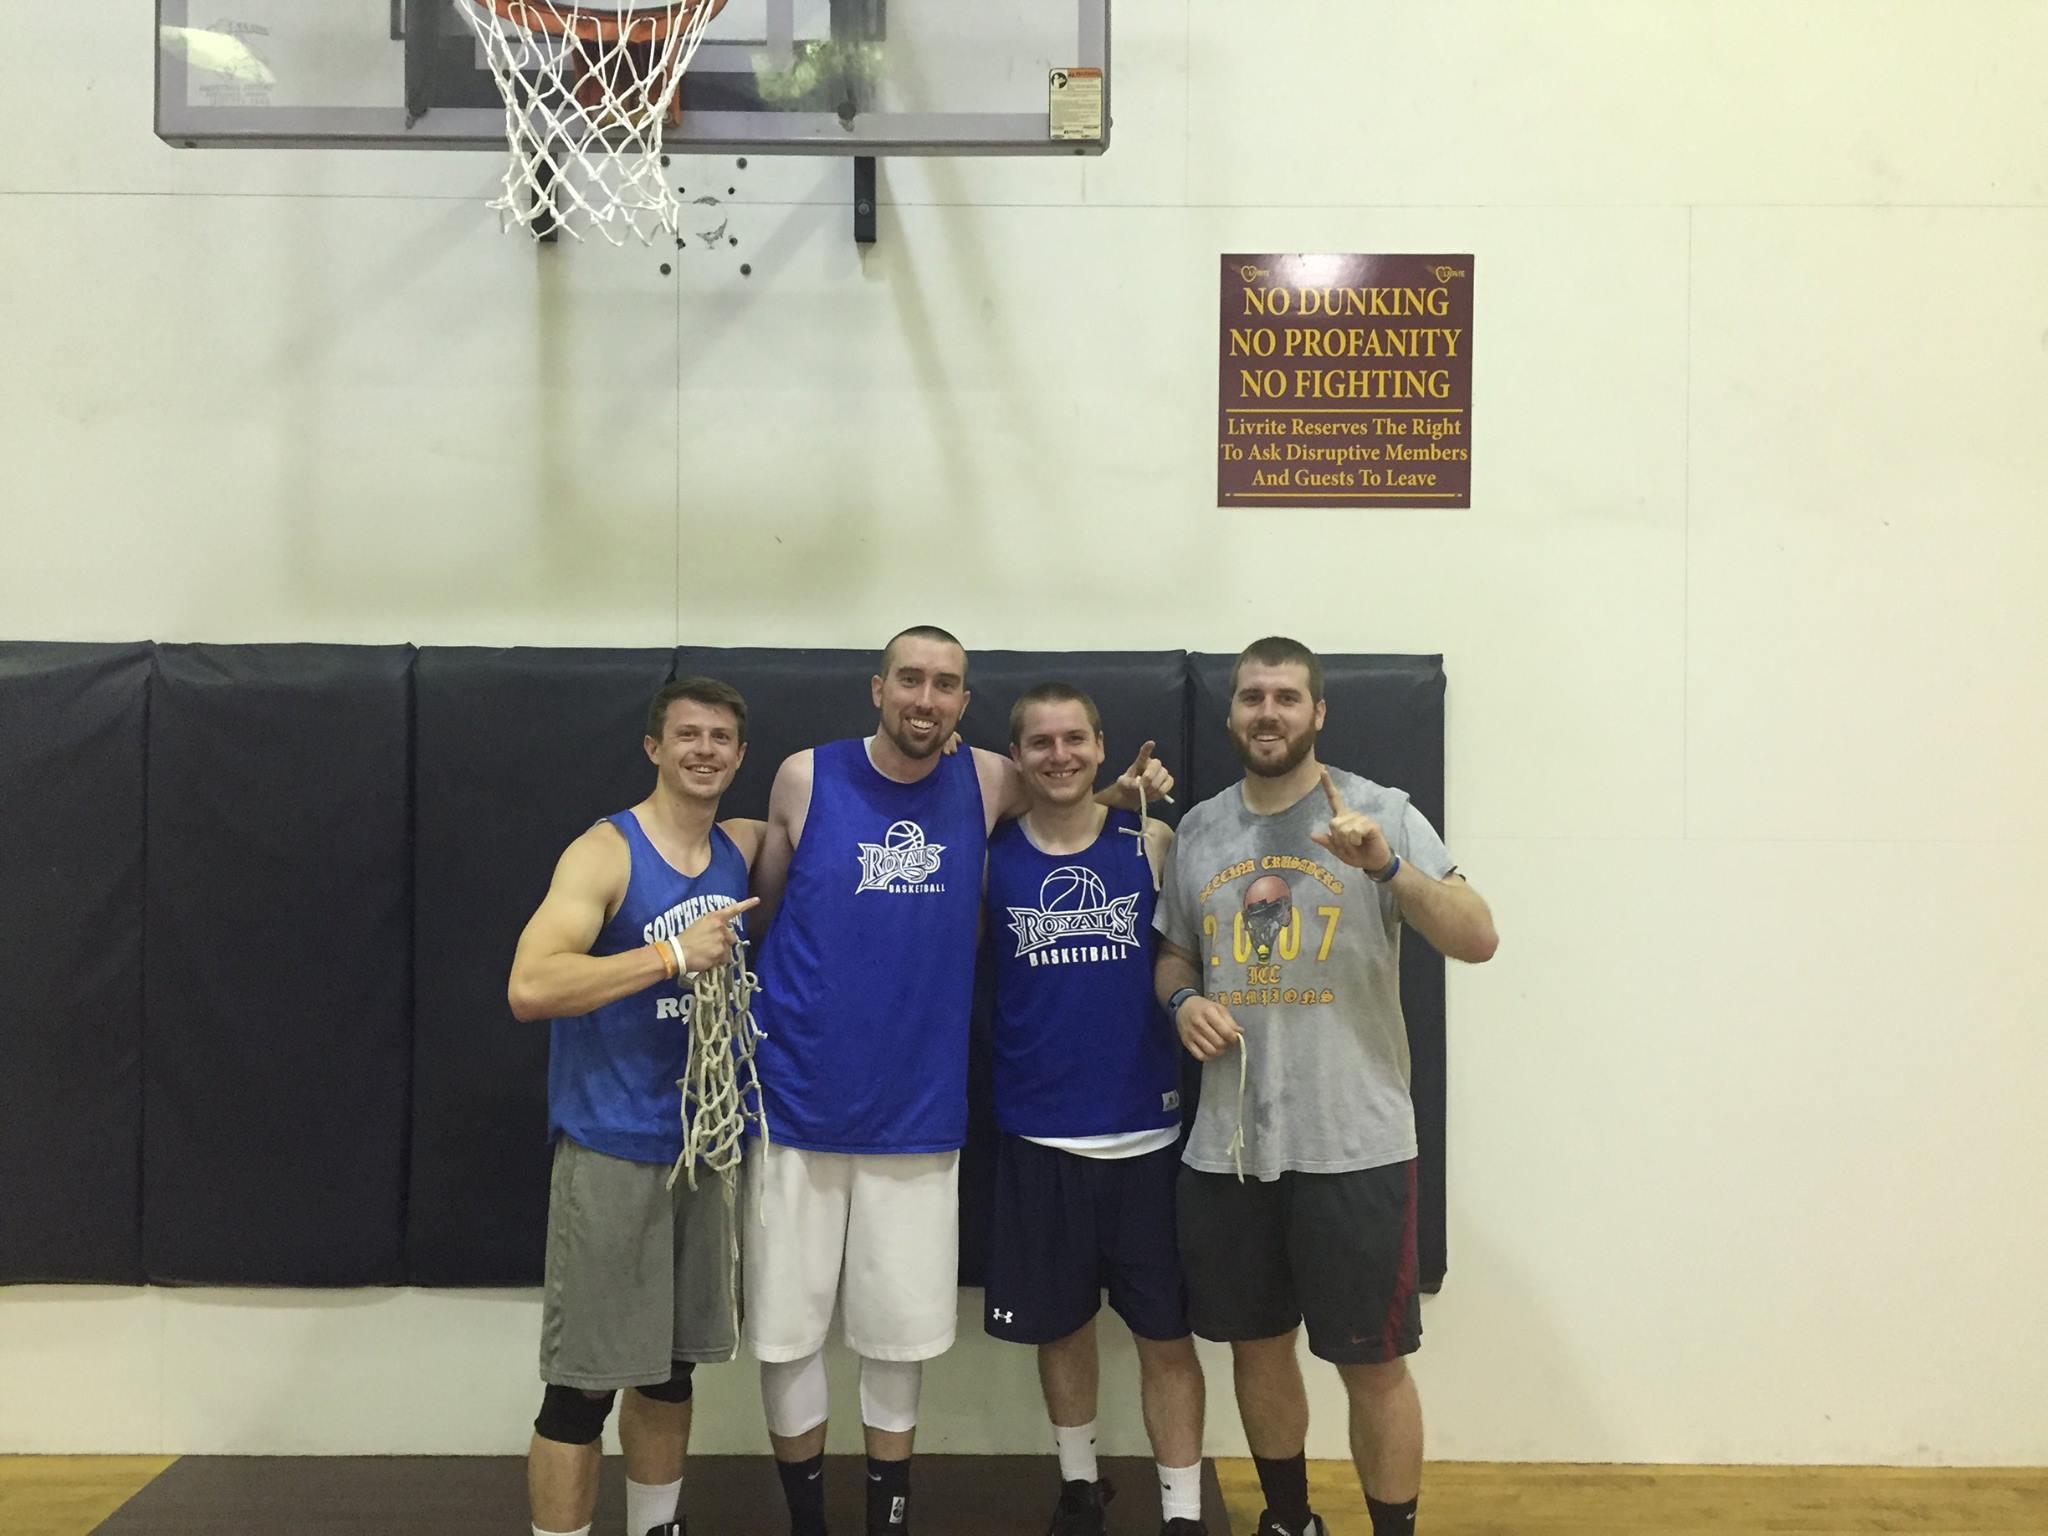 Men's Basketball League Champions